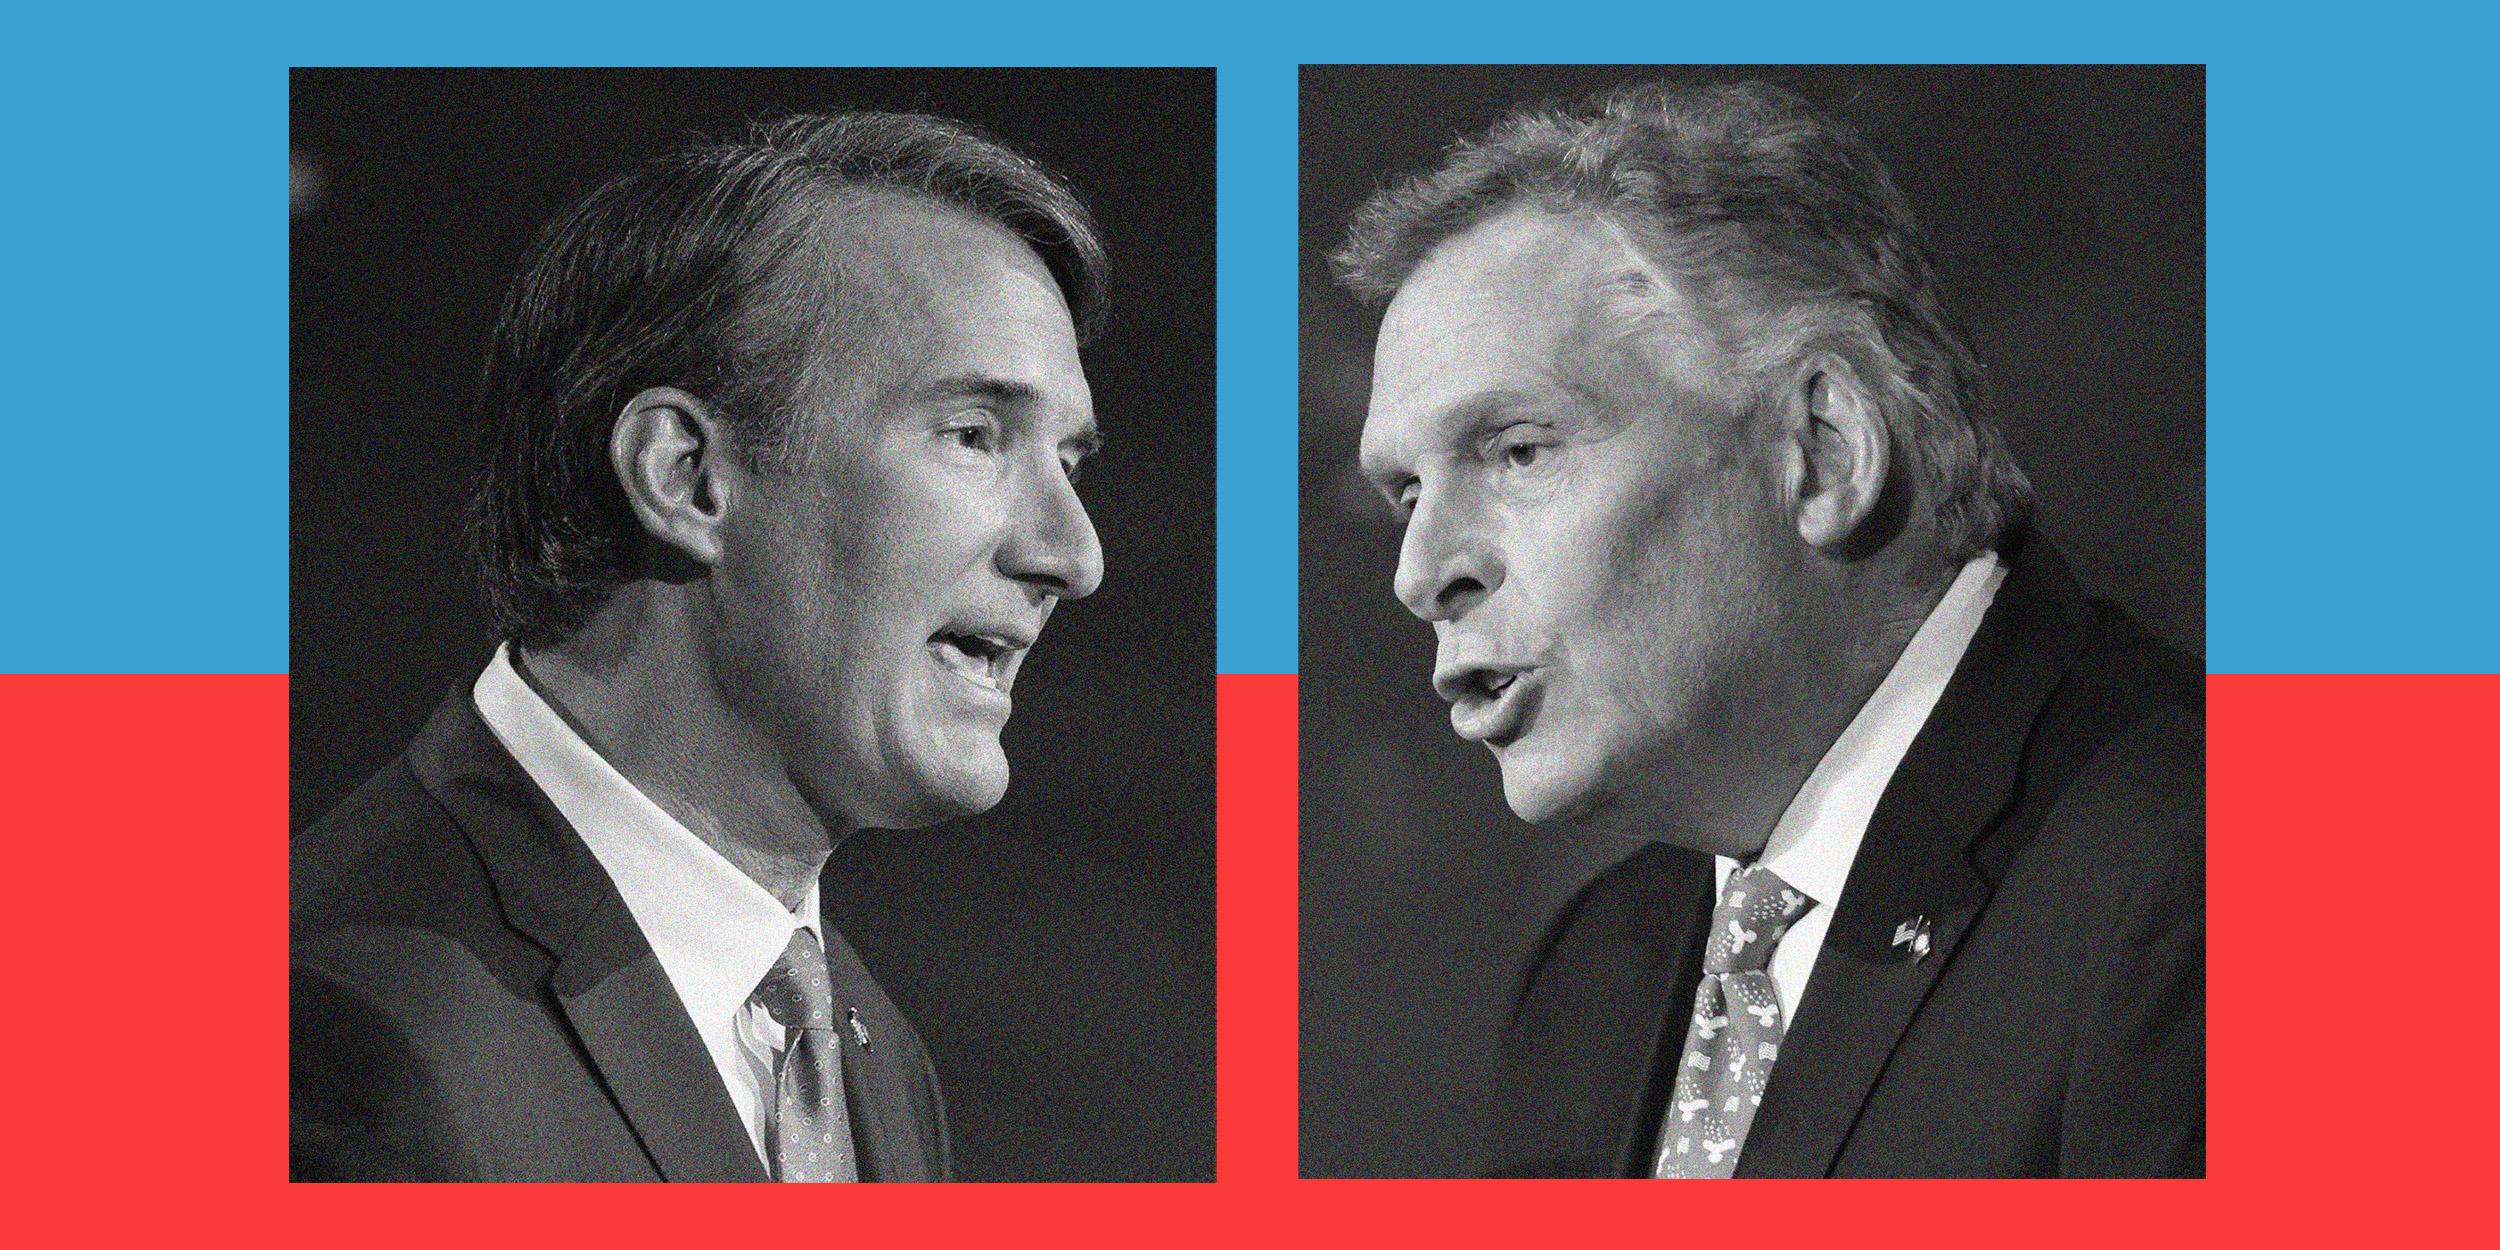 Post-Trump politics put to test as Va. governor's race tightens